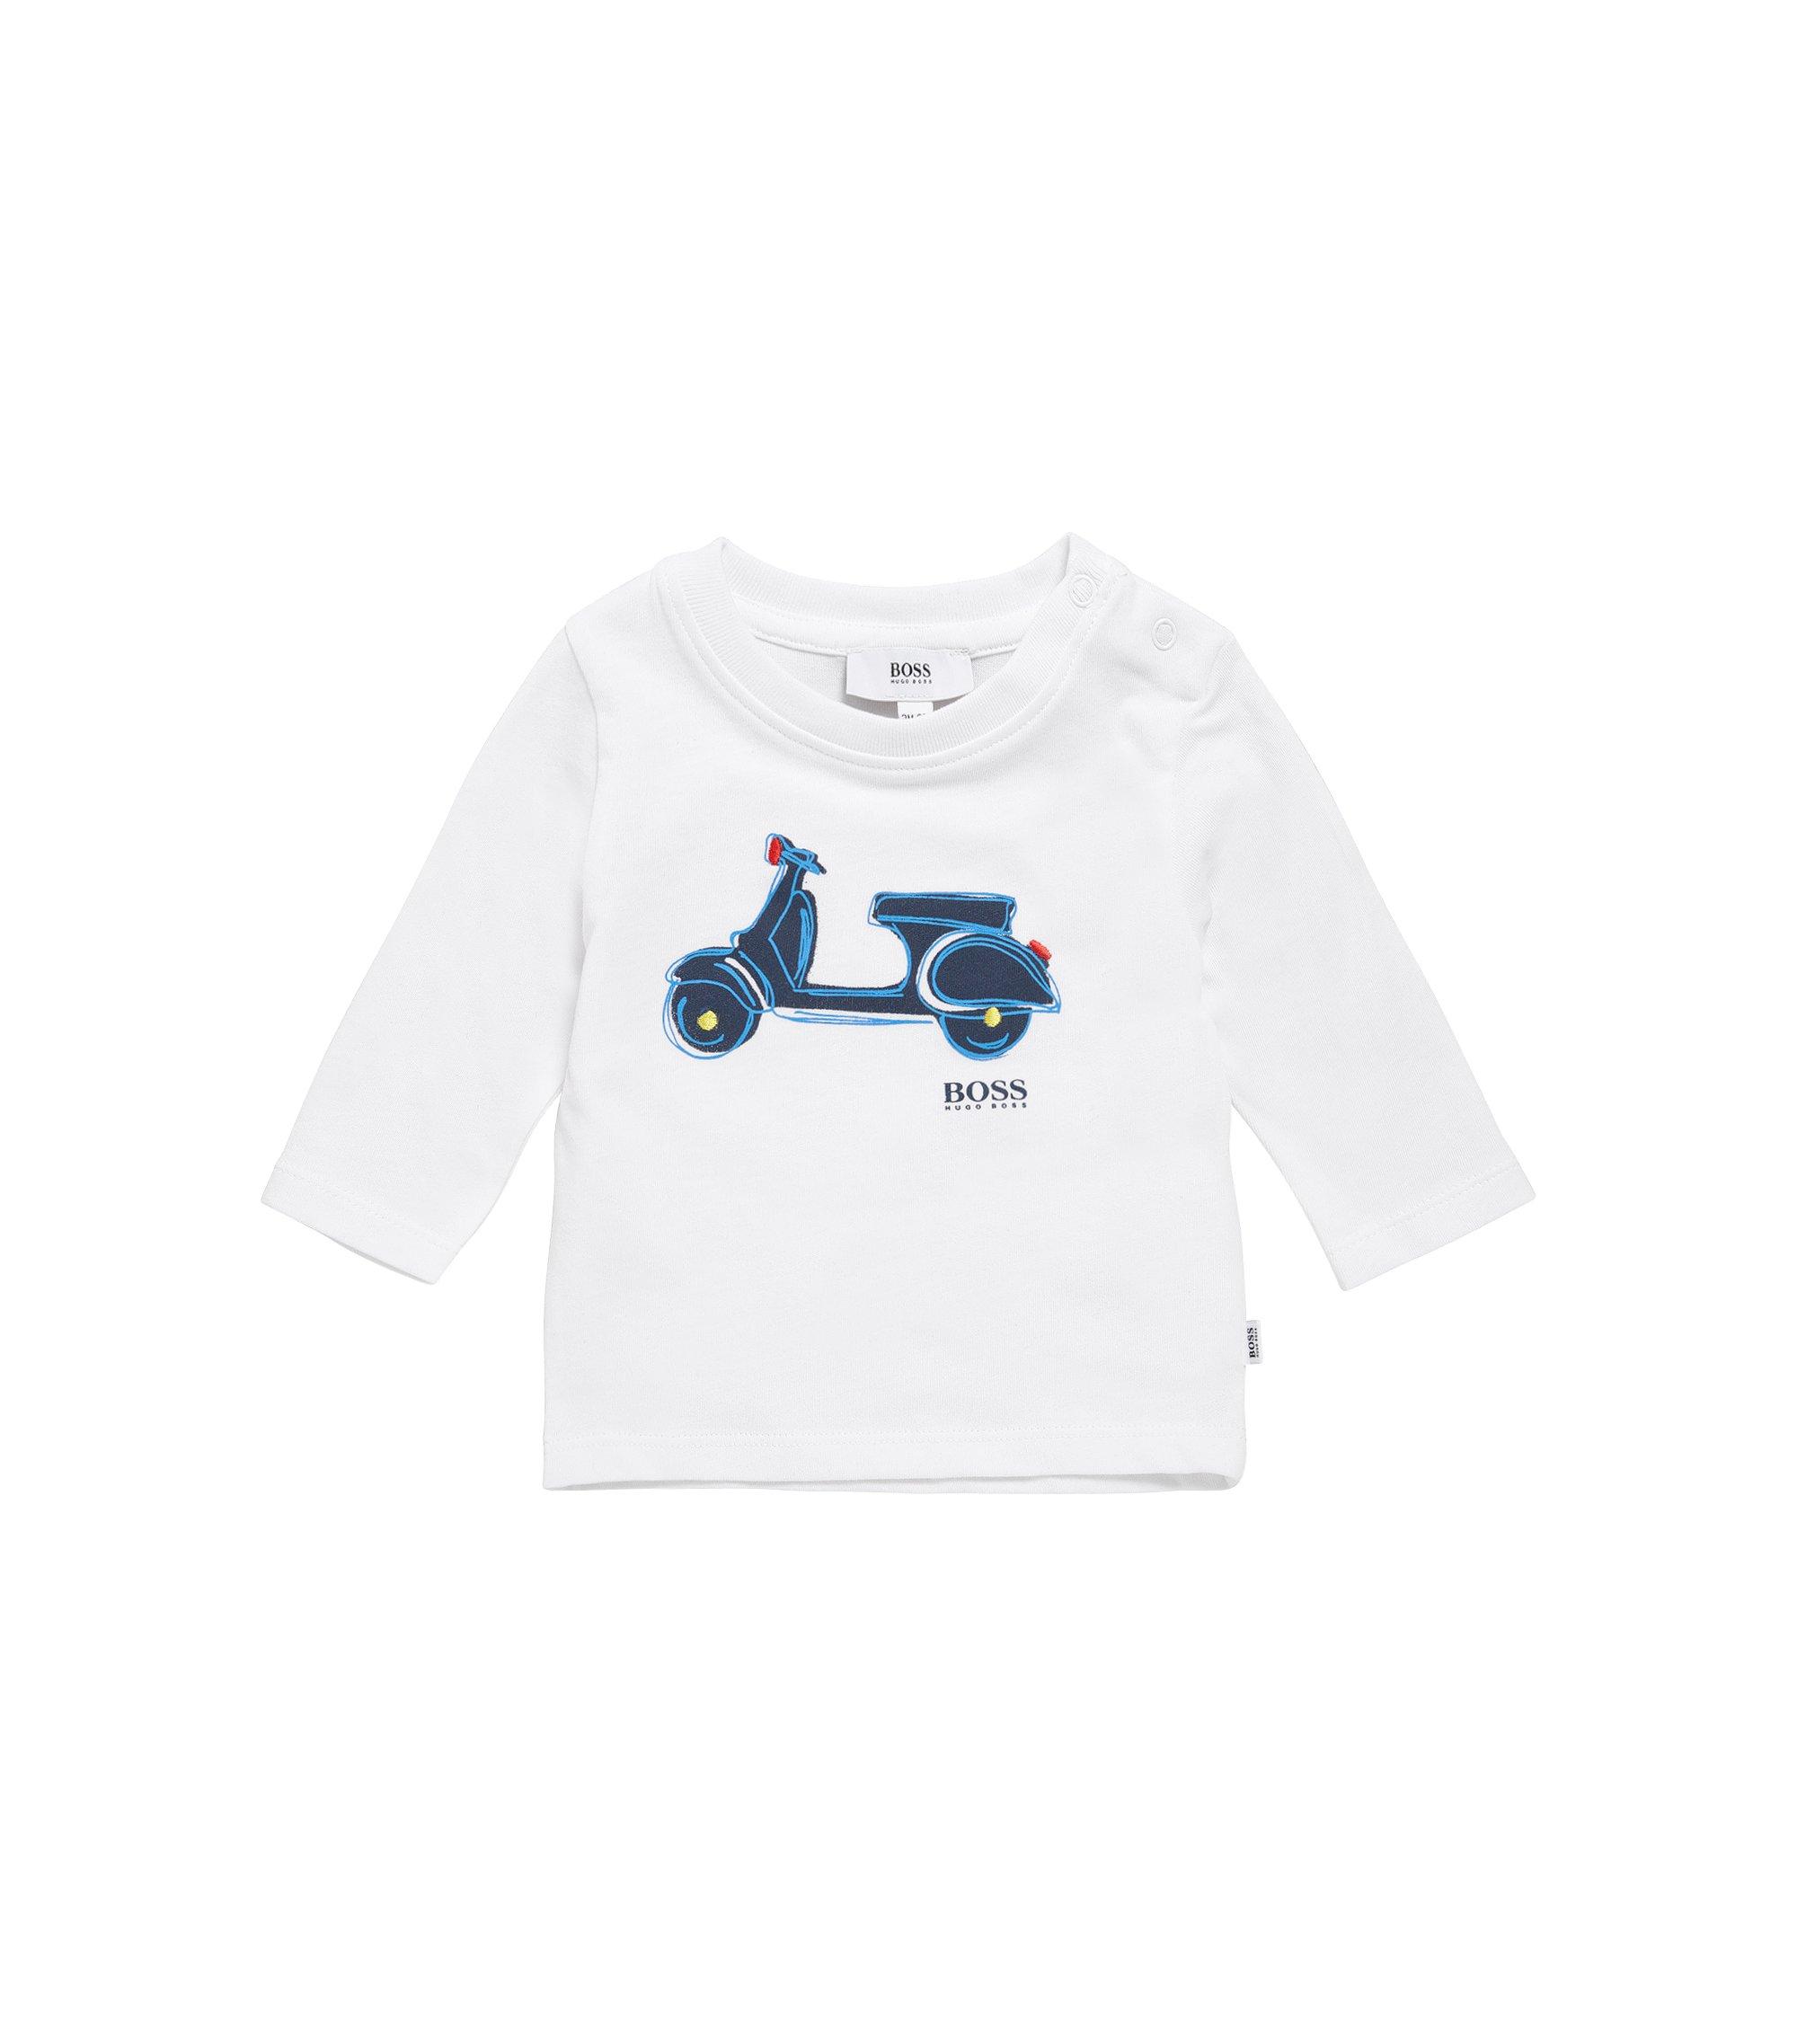 Kids-Longsleeve aus Baumwolle mit Print: 'J05507', Weiß